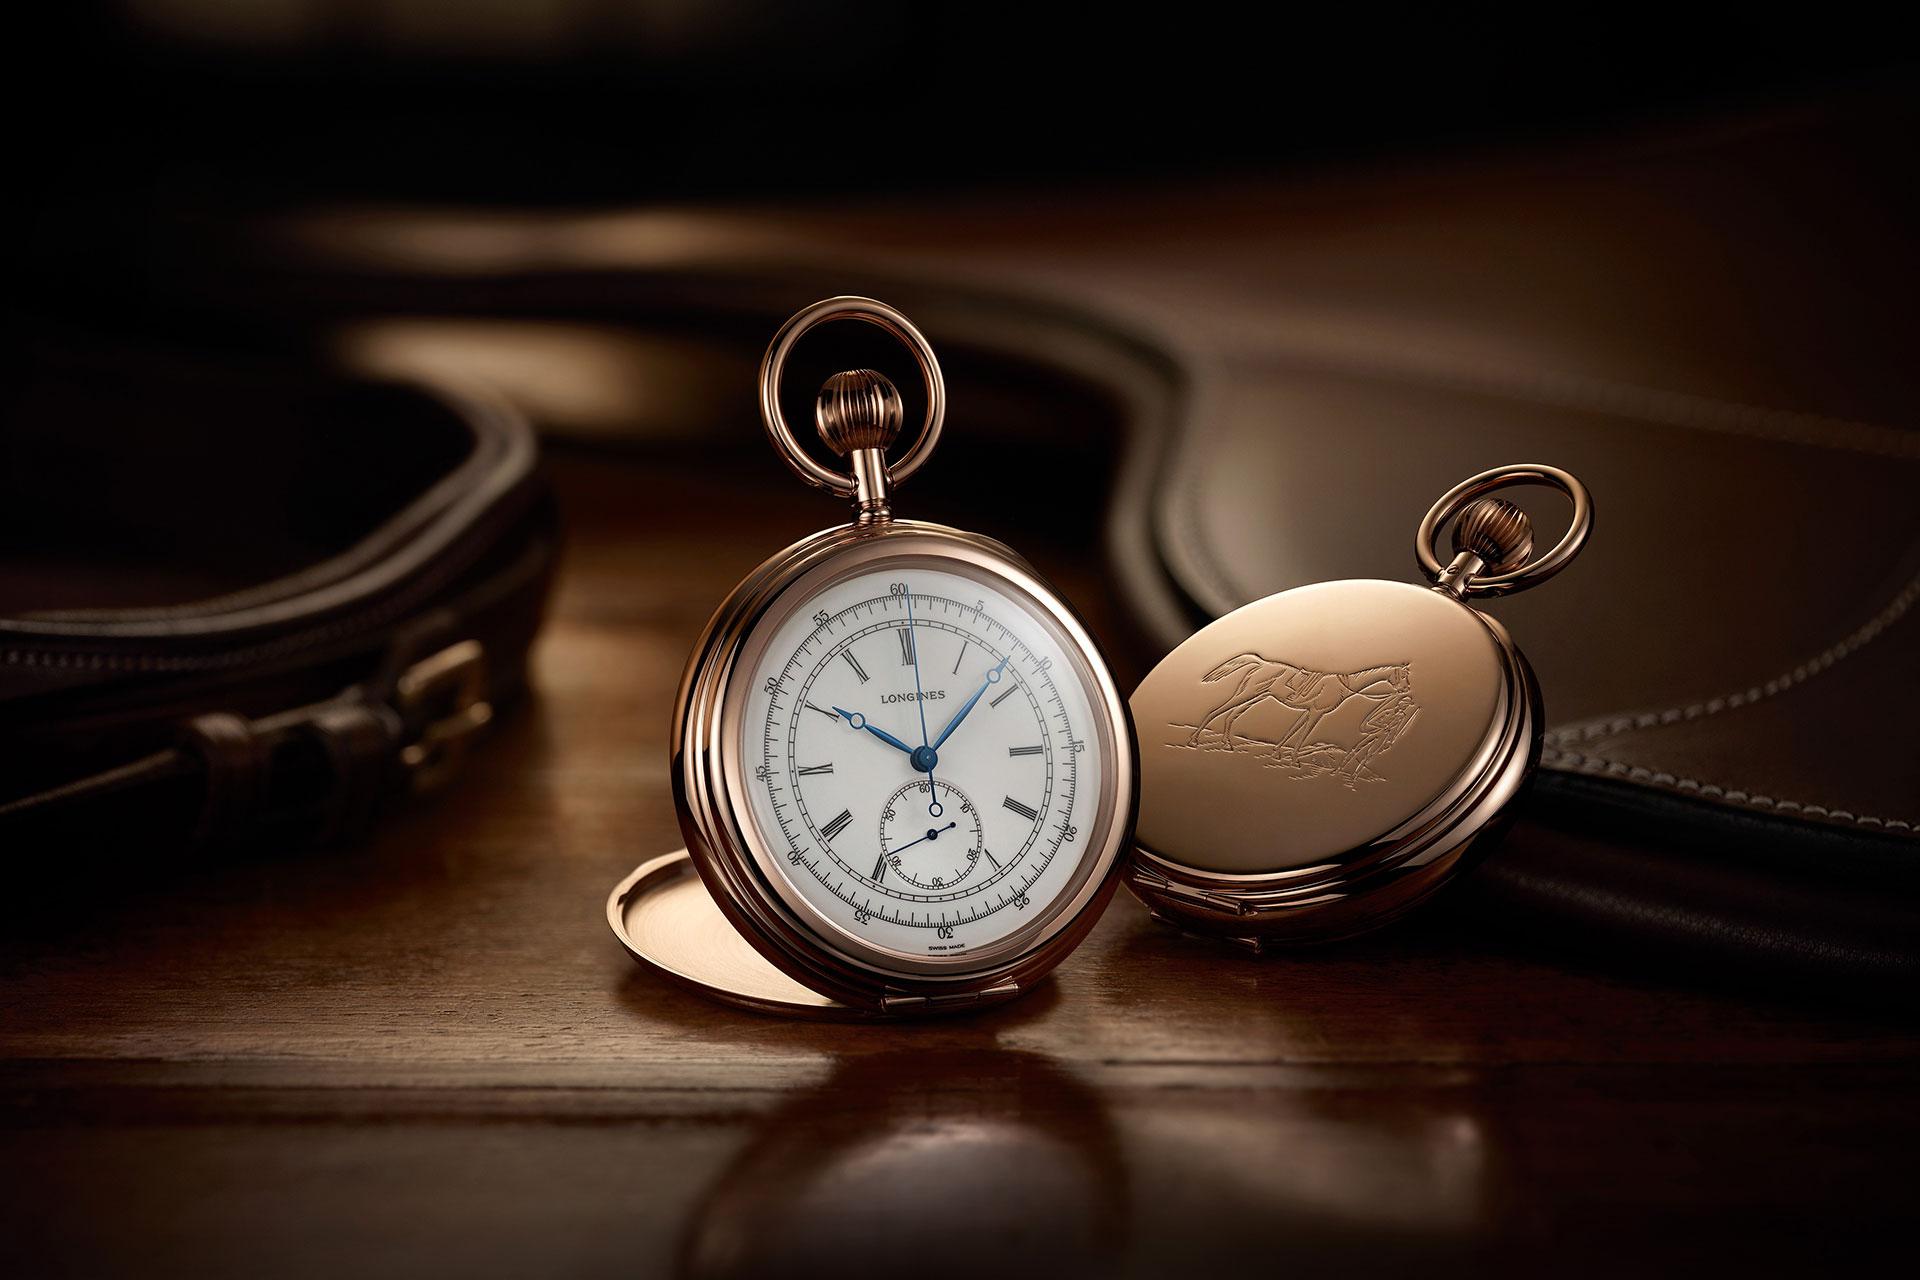 baselworld-sand-clock-doppelganger orologio longines